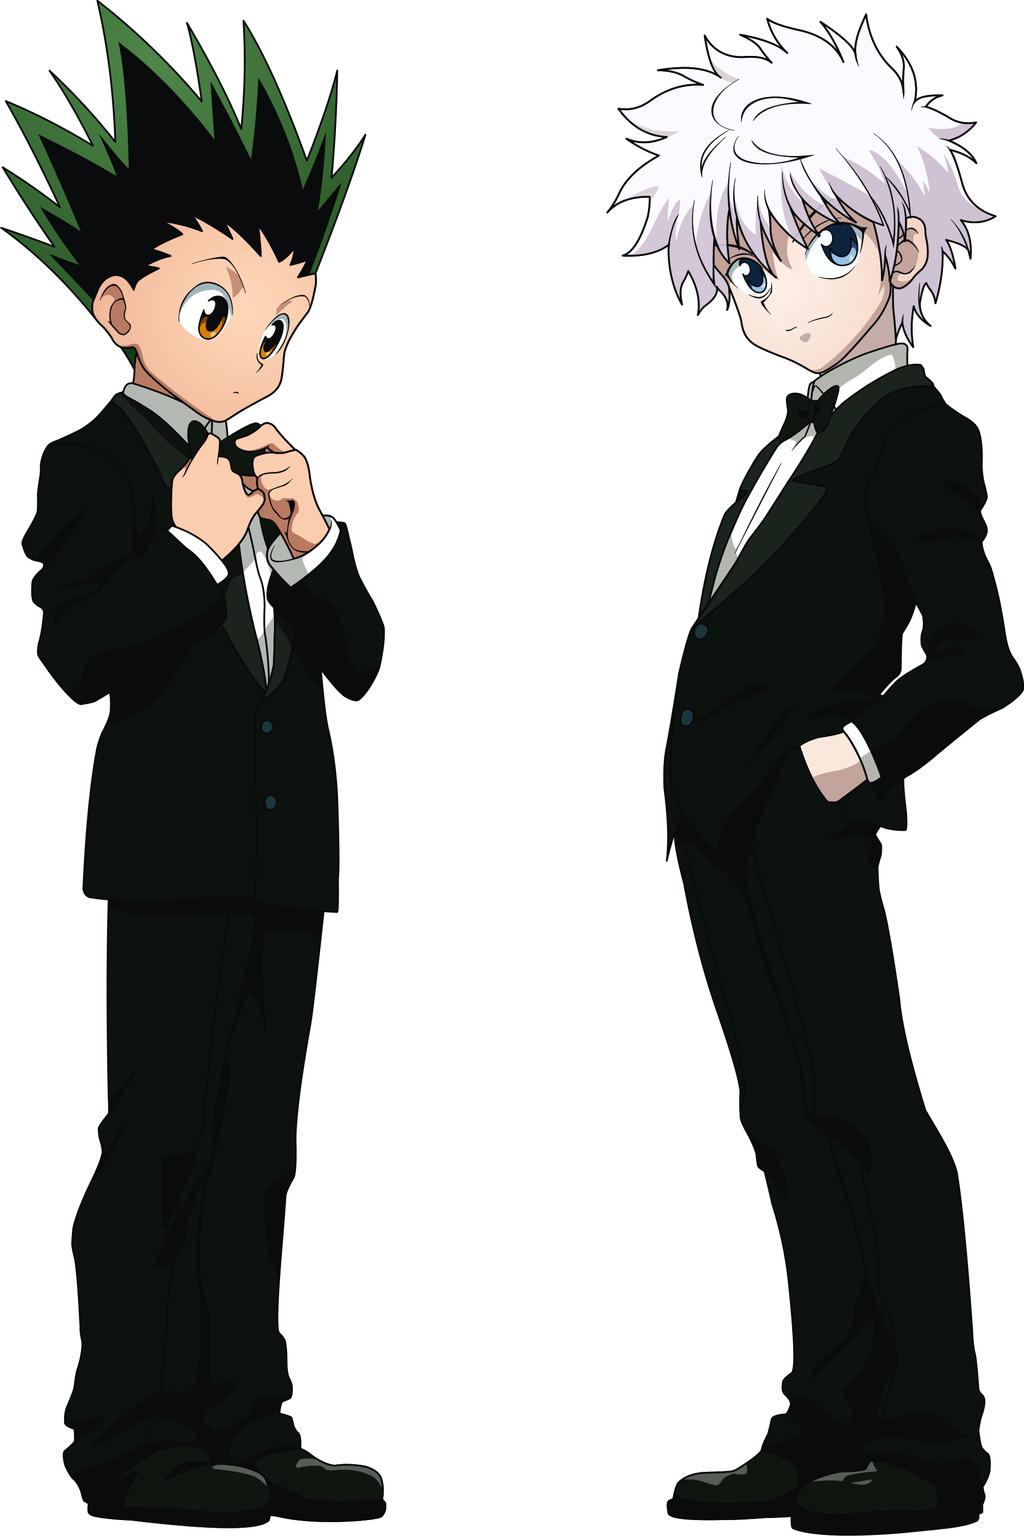 Suite Hunter X Hunter Anime : suite, hunter, anime, Killua, (HXH), Gaston-gaston, DeviantArt, Hunter, Anime,, Hunter,